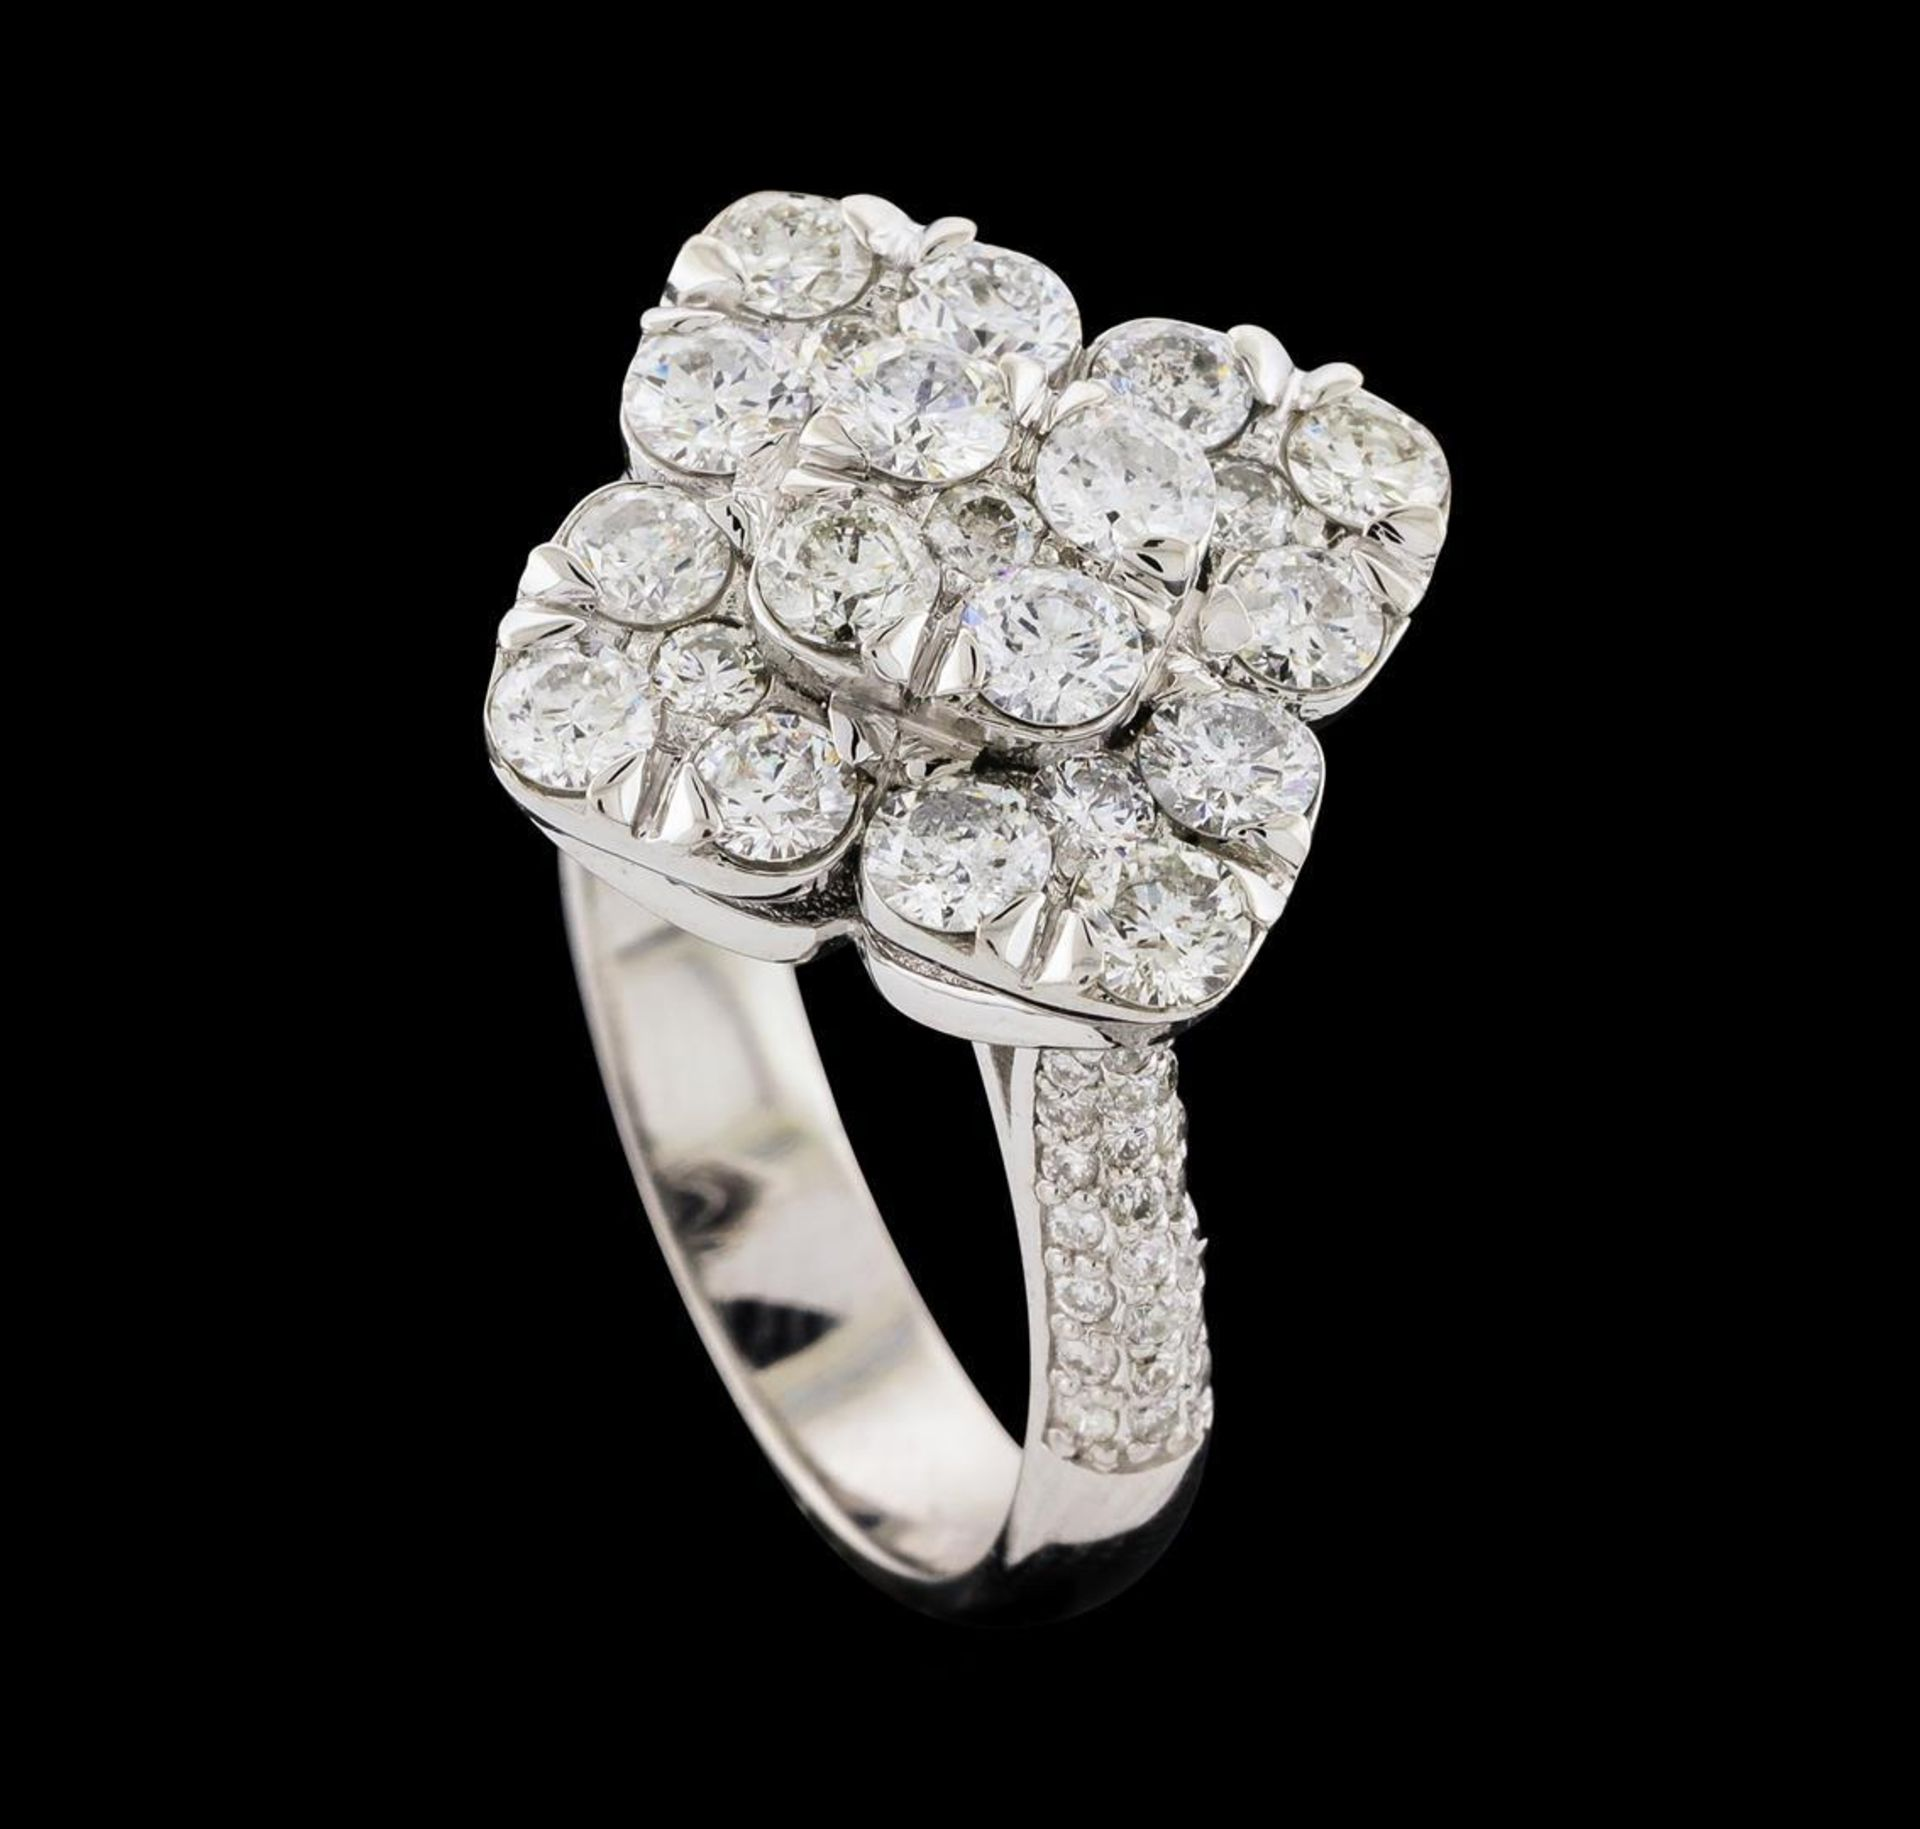 2.12 ctw Diamond Ring - 14KT White Gold - Image 4 of 5